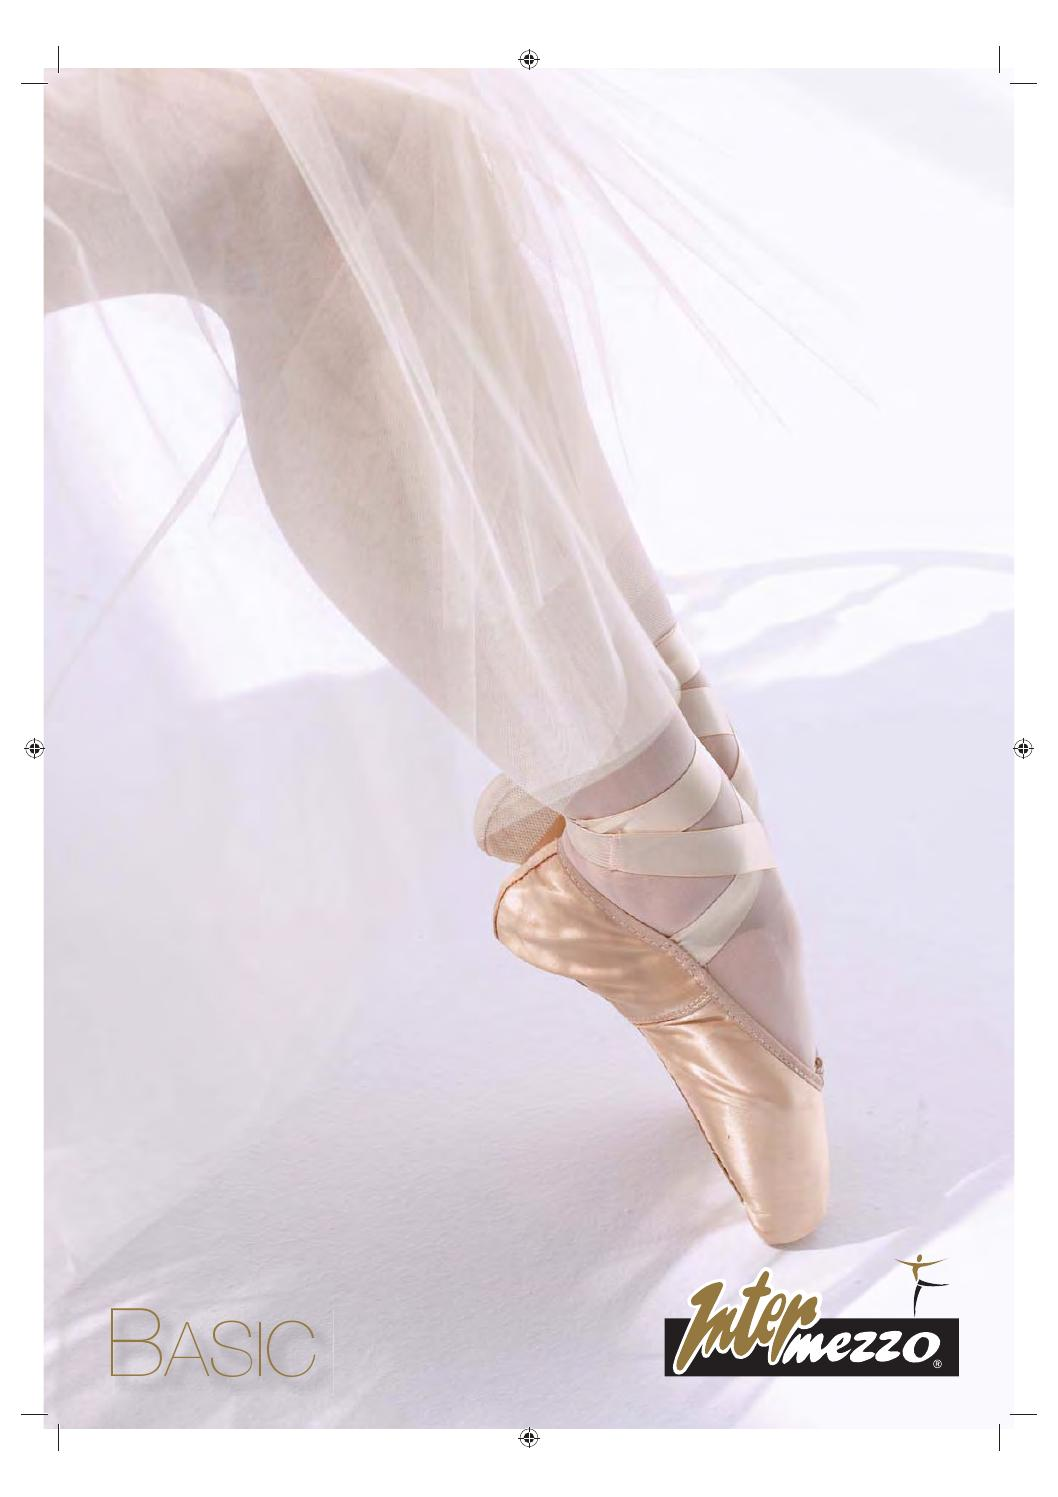 Puntas de ballet intermezzo modelo 7265